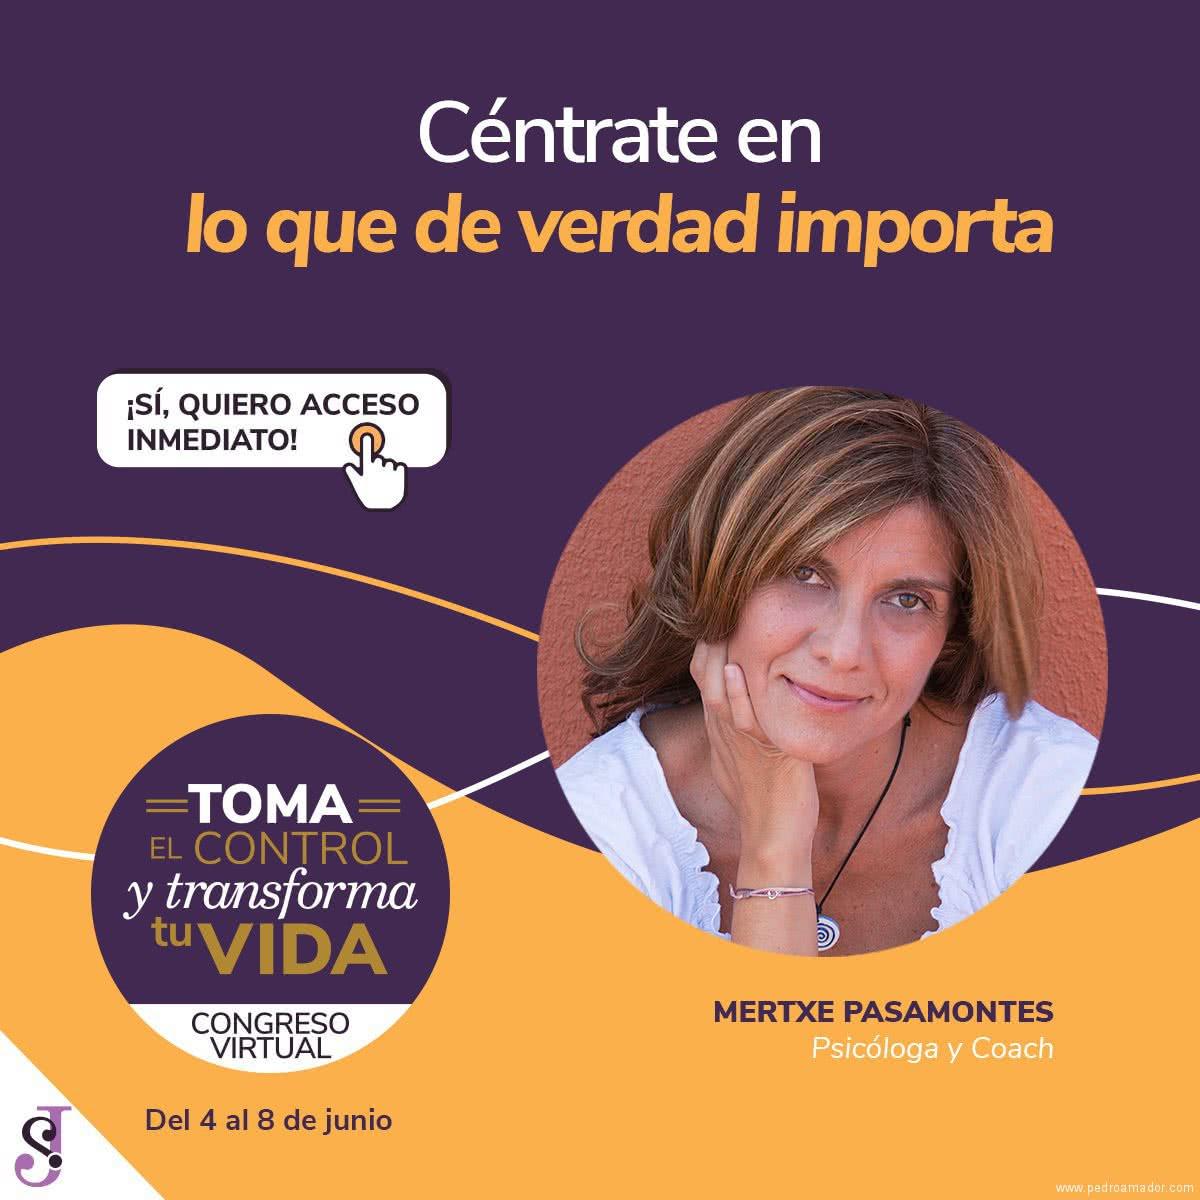 Transforma tu vida - Mertxe Pasamontes